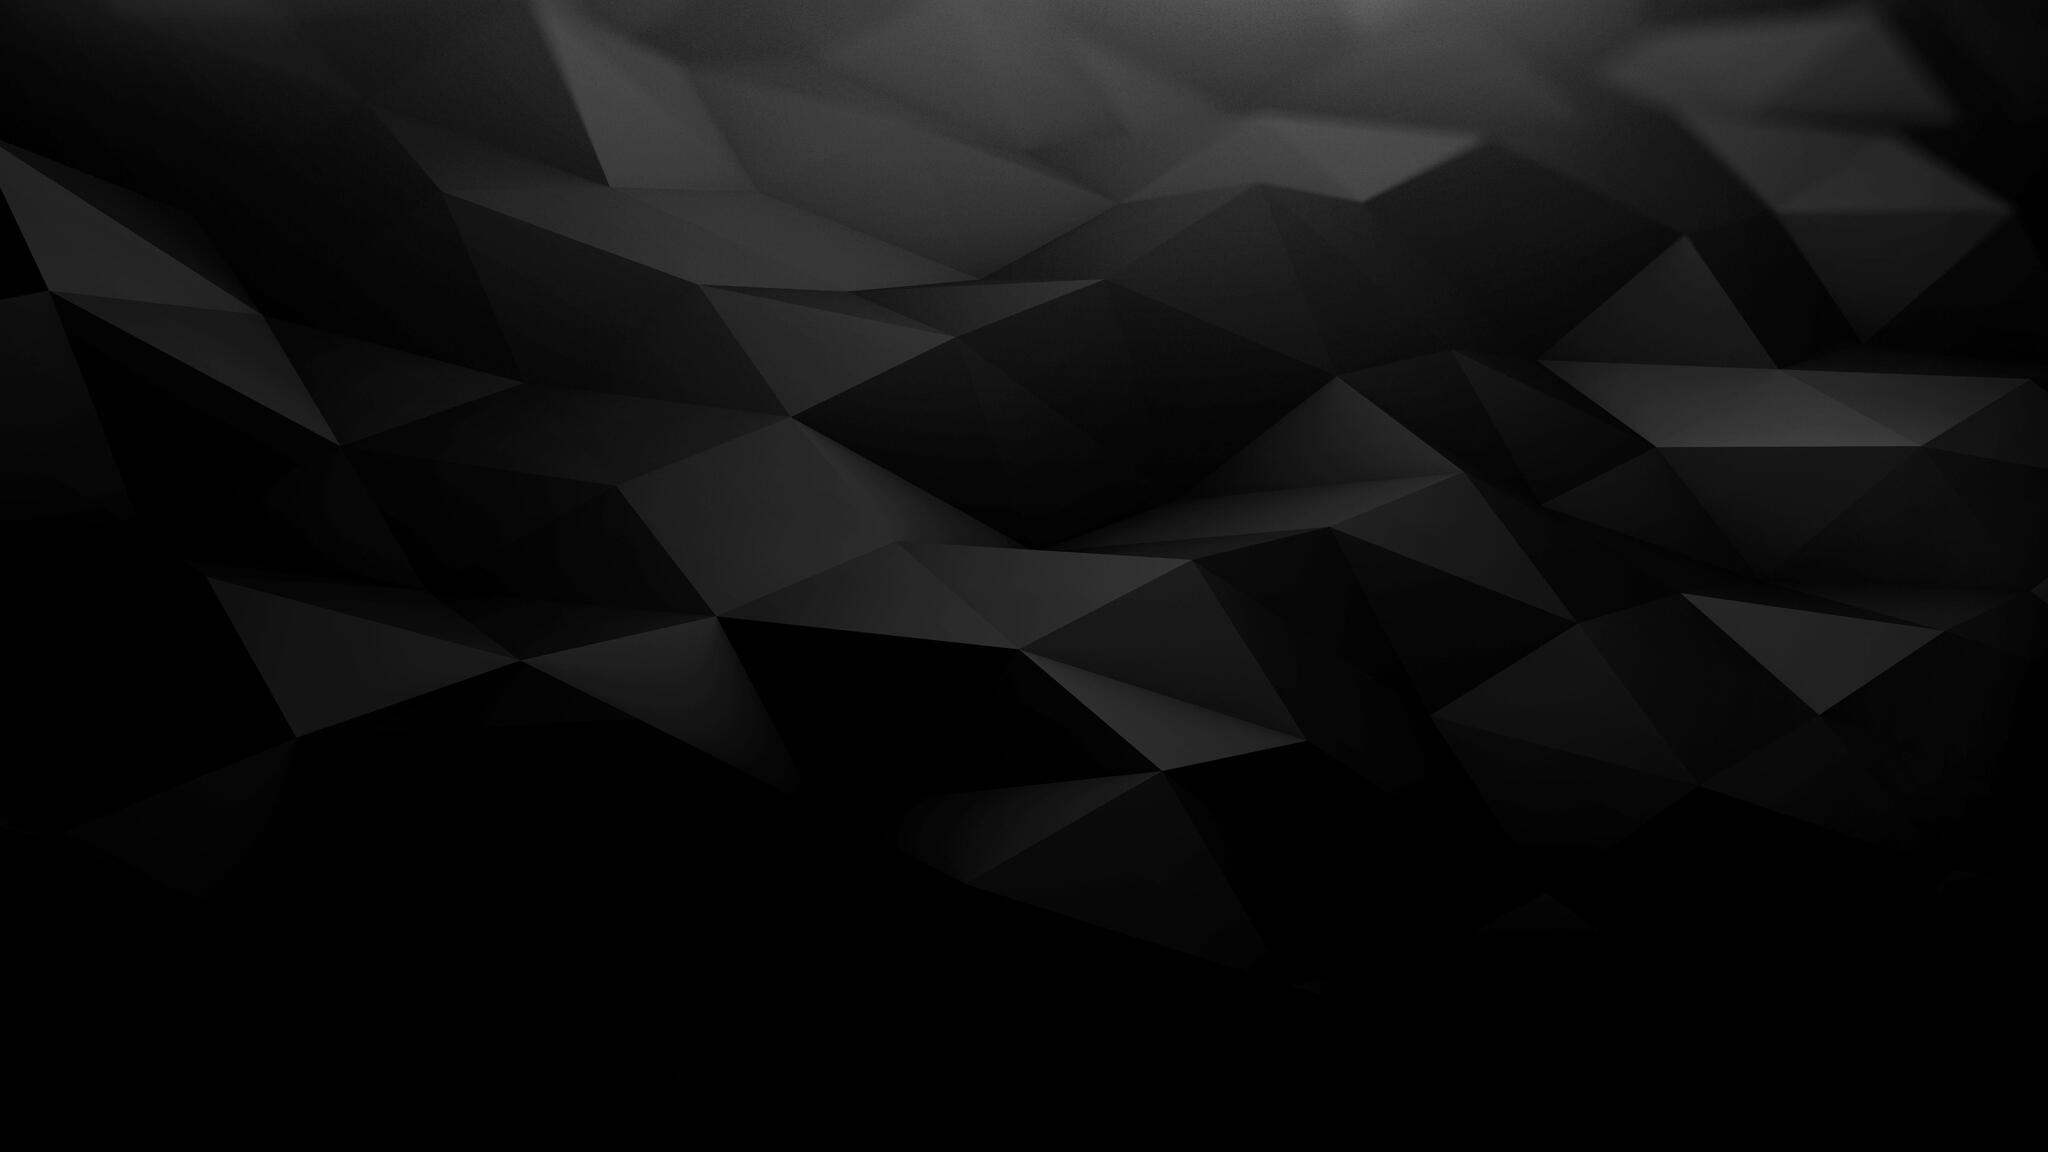 2048x1152 Noir 5k 2048x1152 Resolution Hd 4k Wallpapers